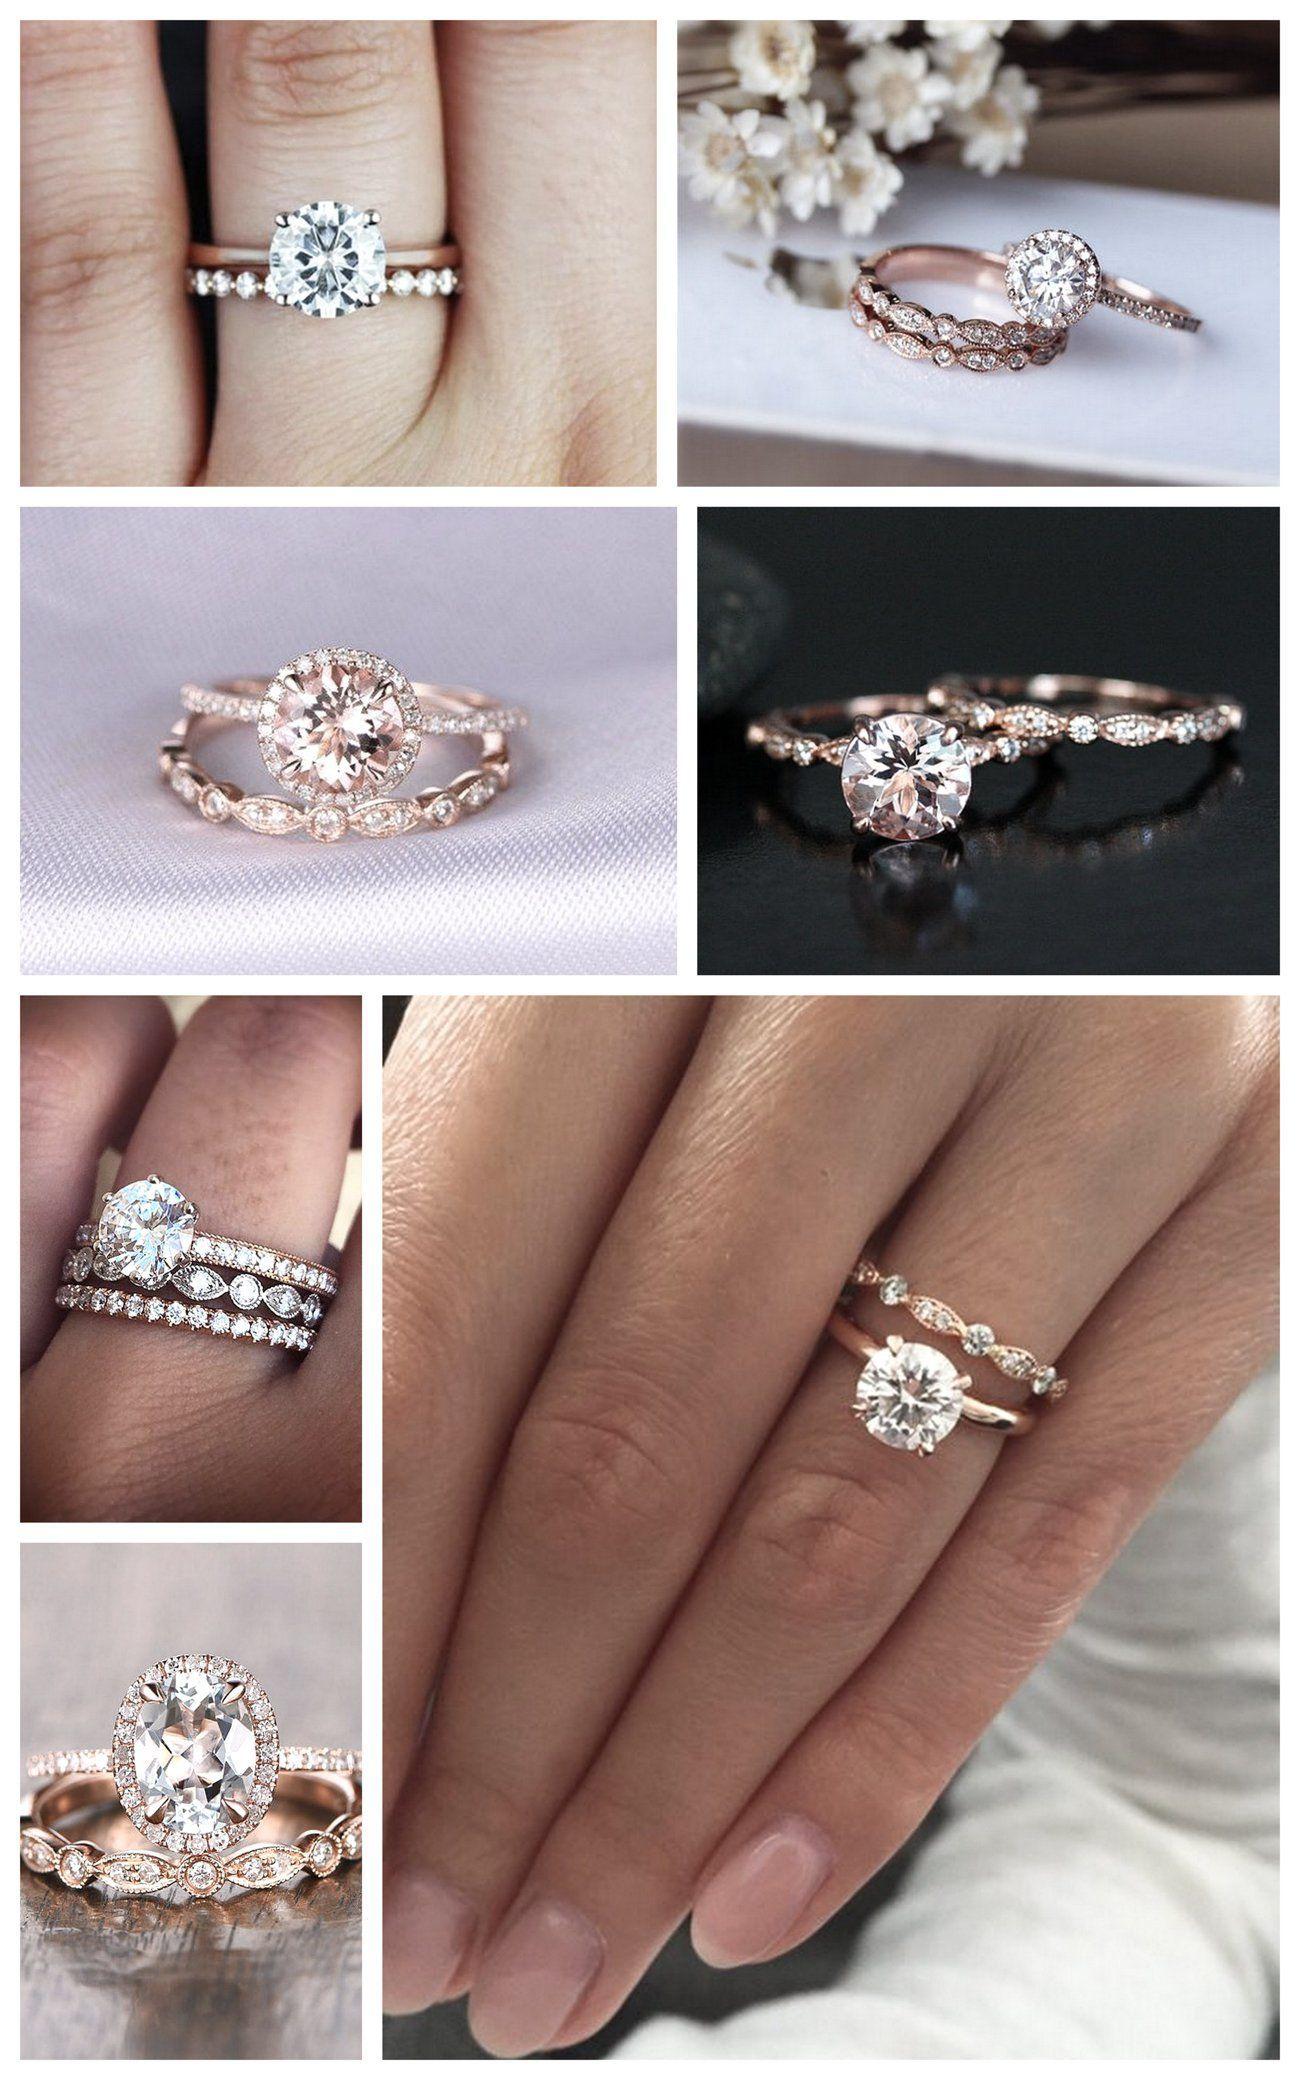 Wedding Ring Inspo Marinagalleryfineart2322jessicasimpson: Carrie Underwood Wedding Ring Dimond At Reisefeber.org